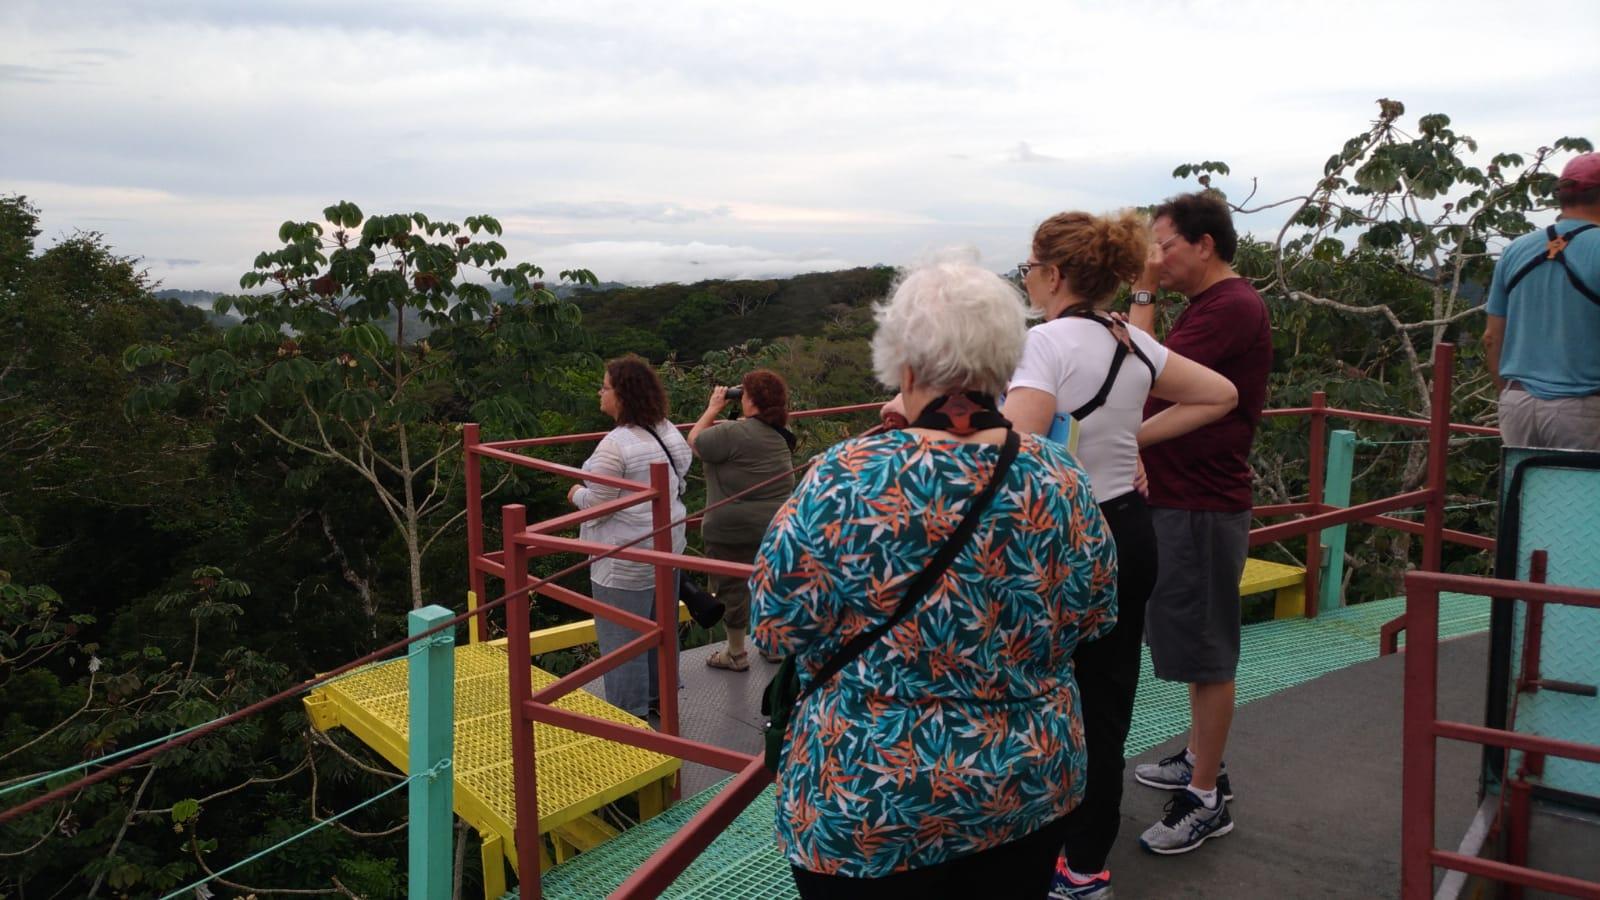 Birding the Canopy Tower